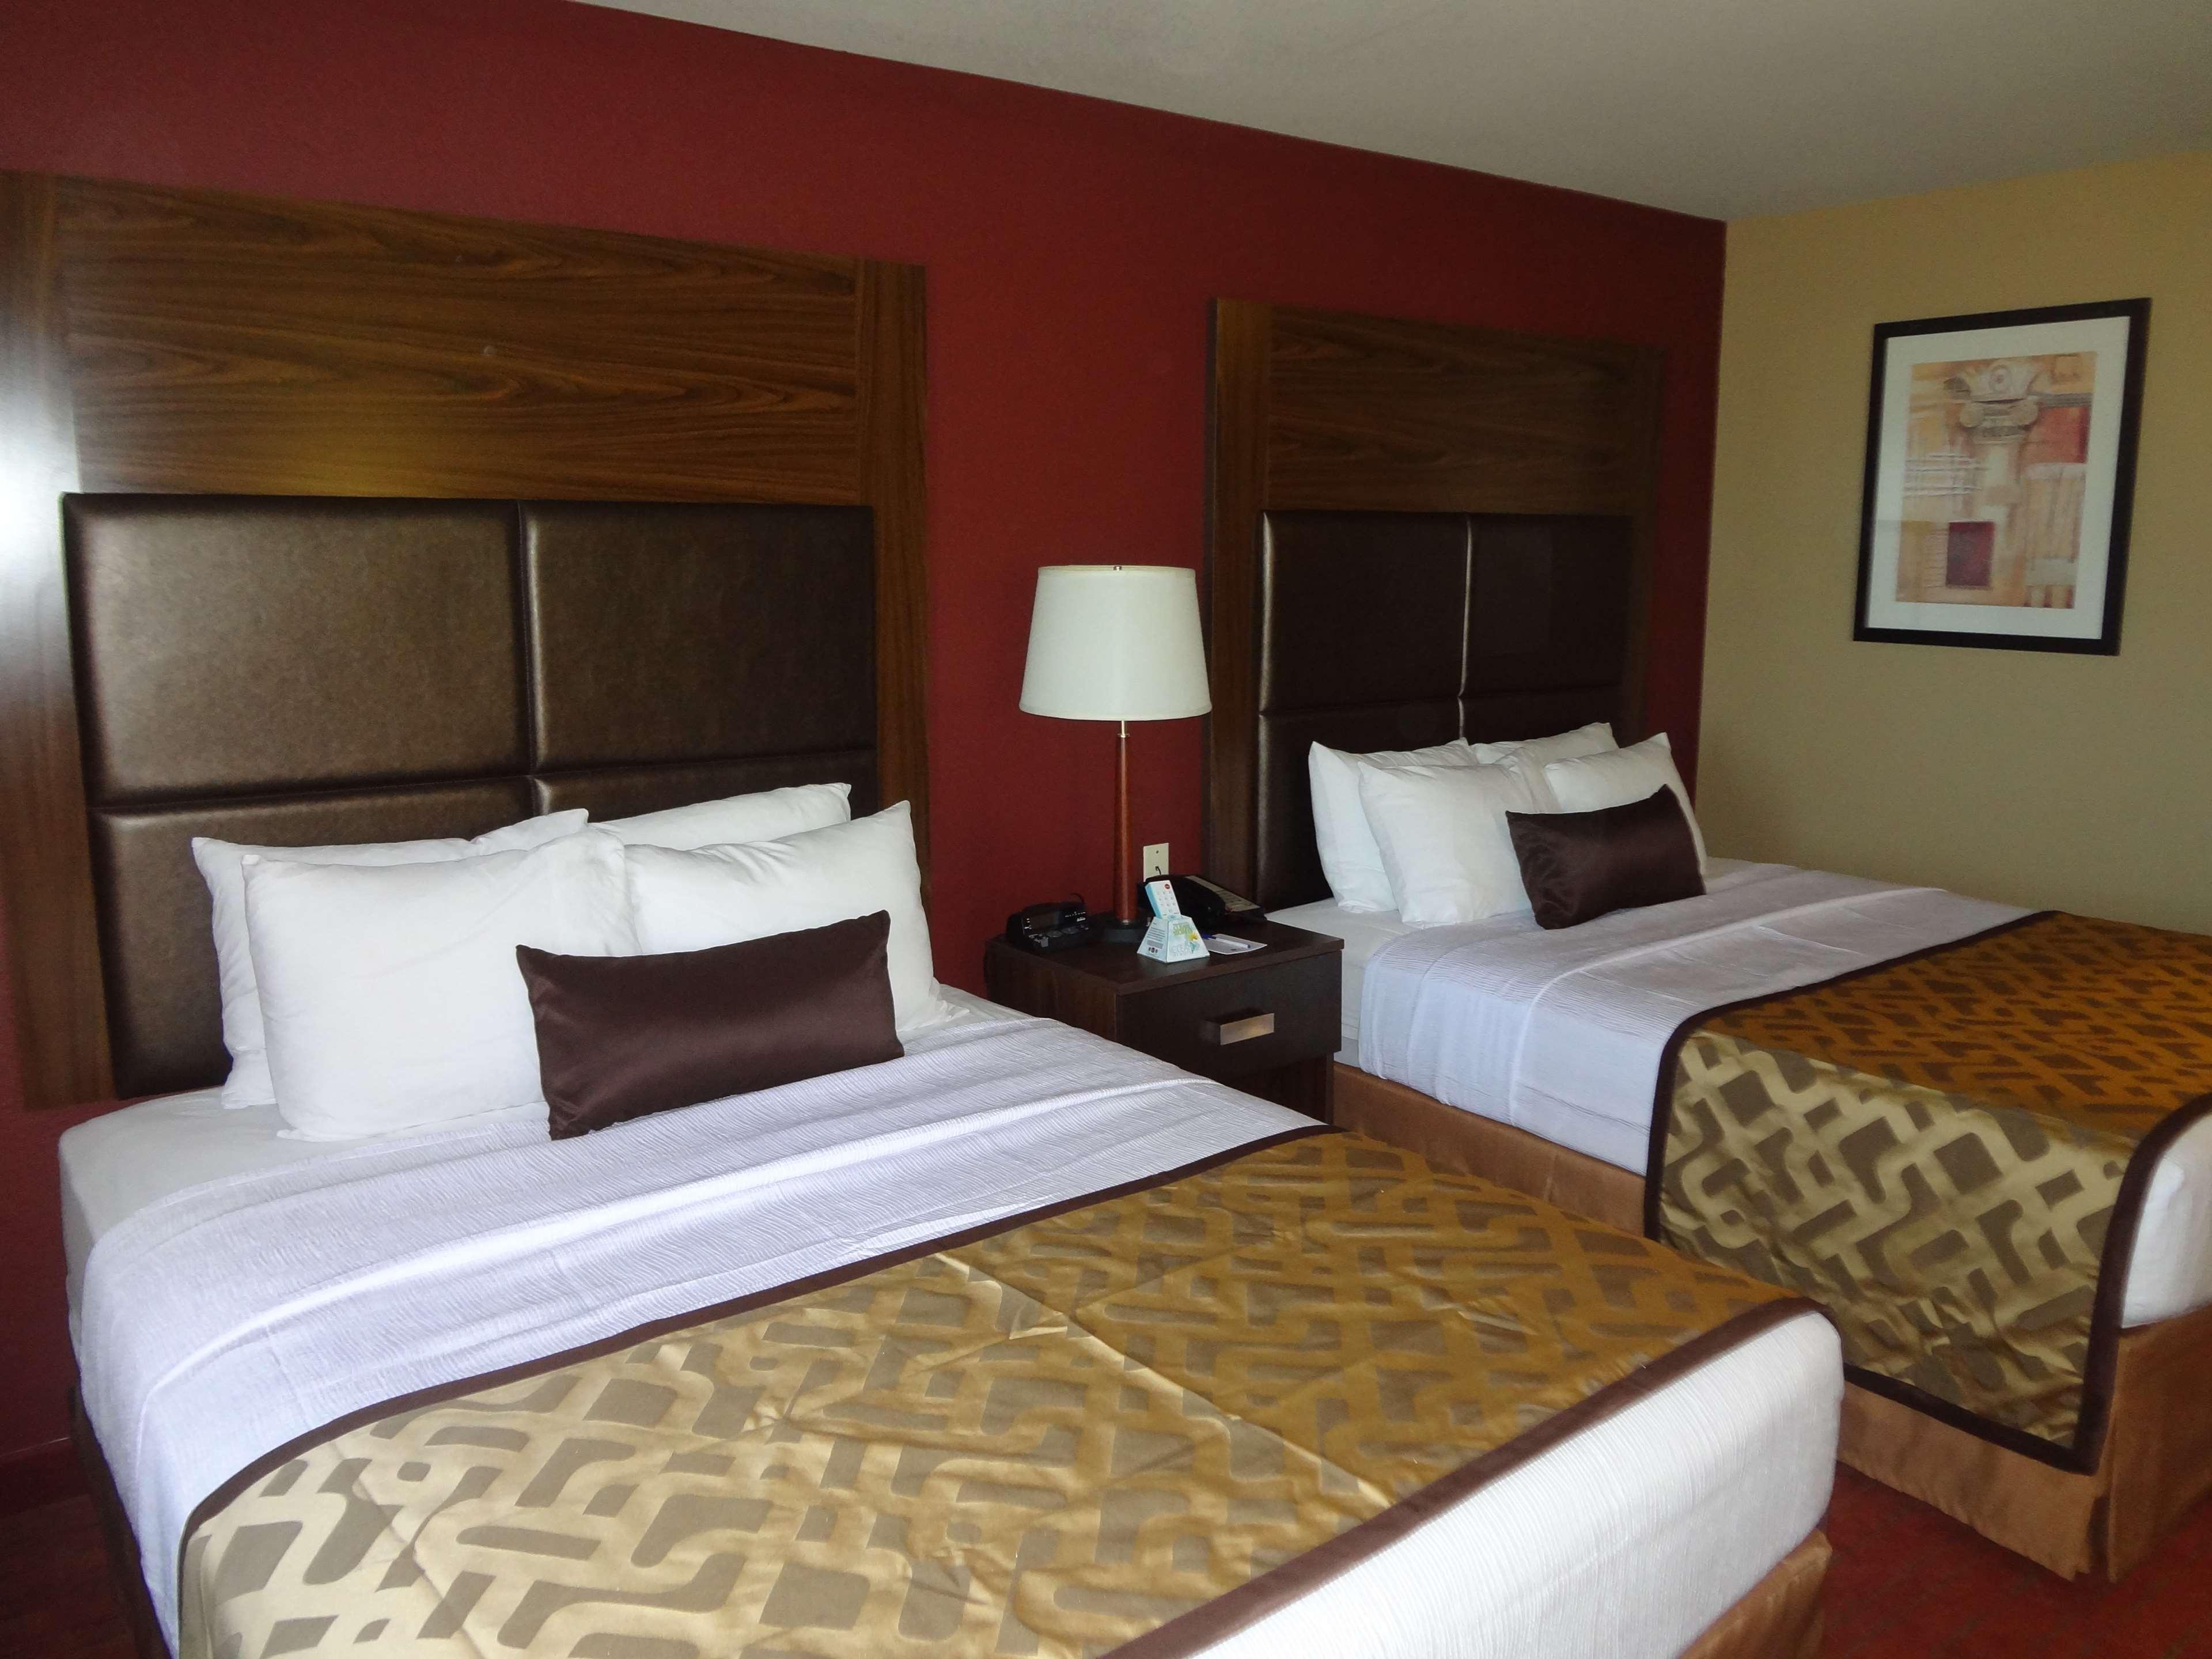 Best Western Plus Woodland Hills Hotel & Suites image 43